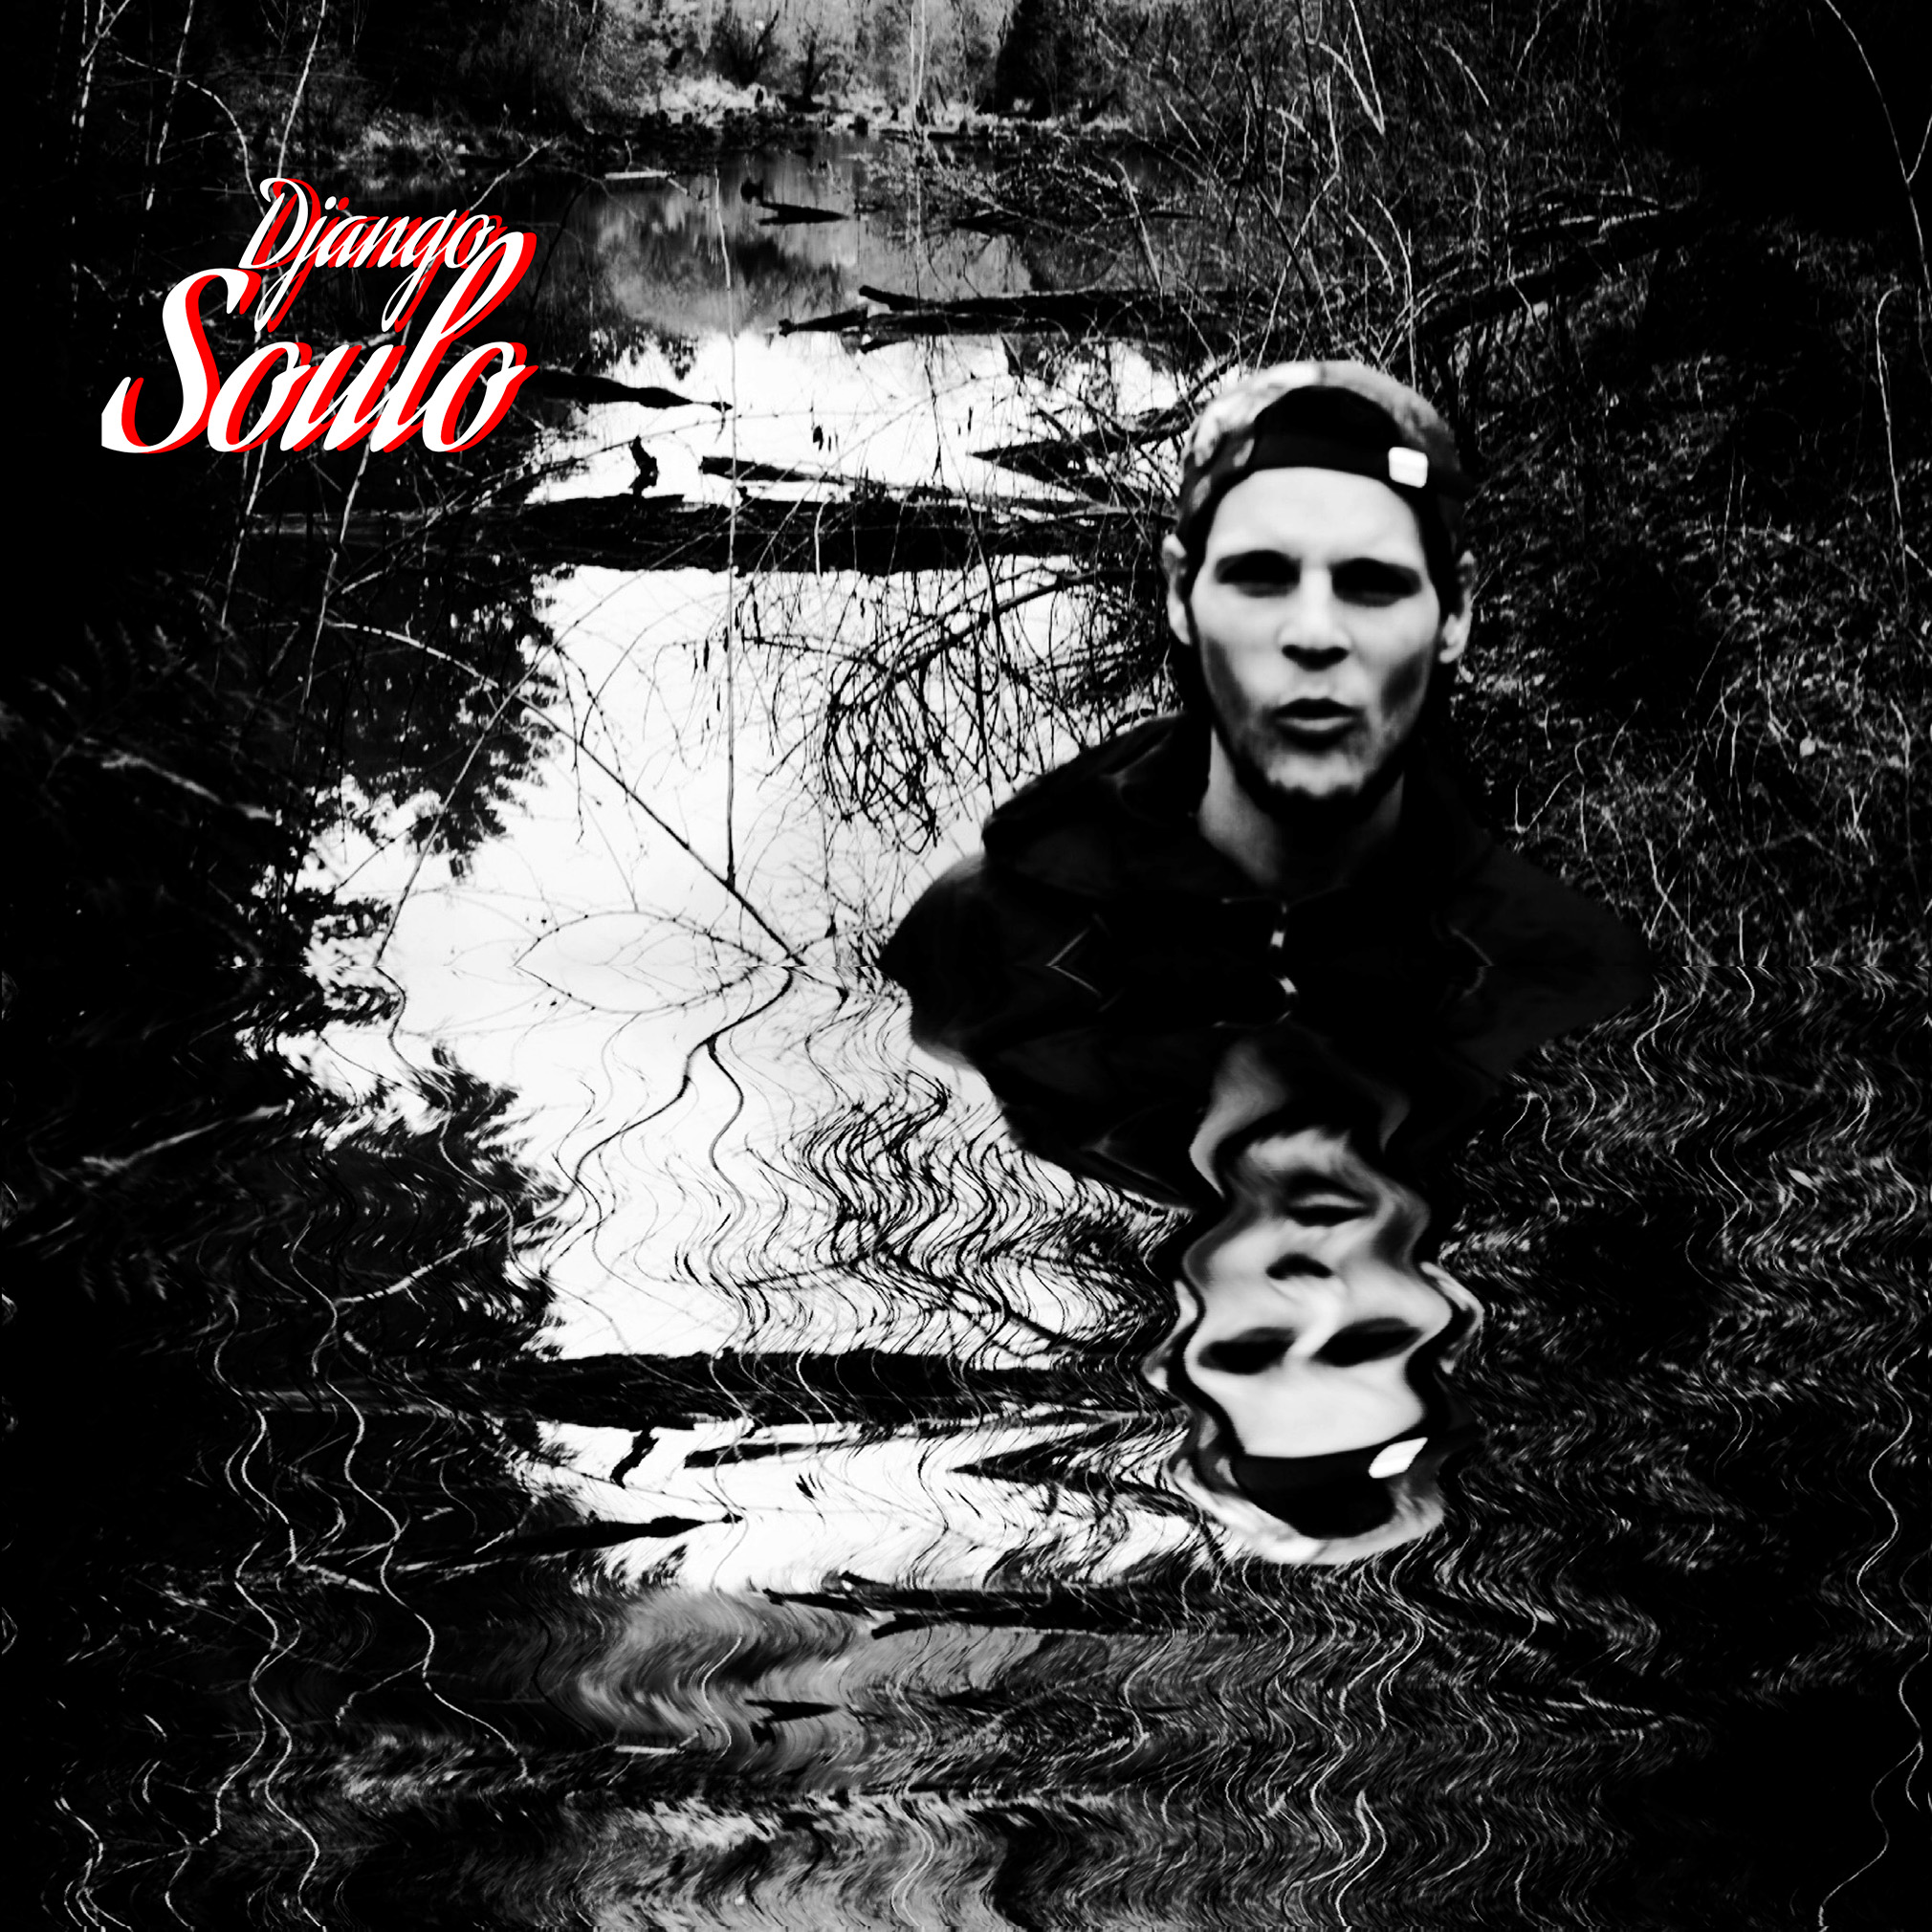 'Django Soulo' - Album Cover